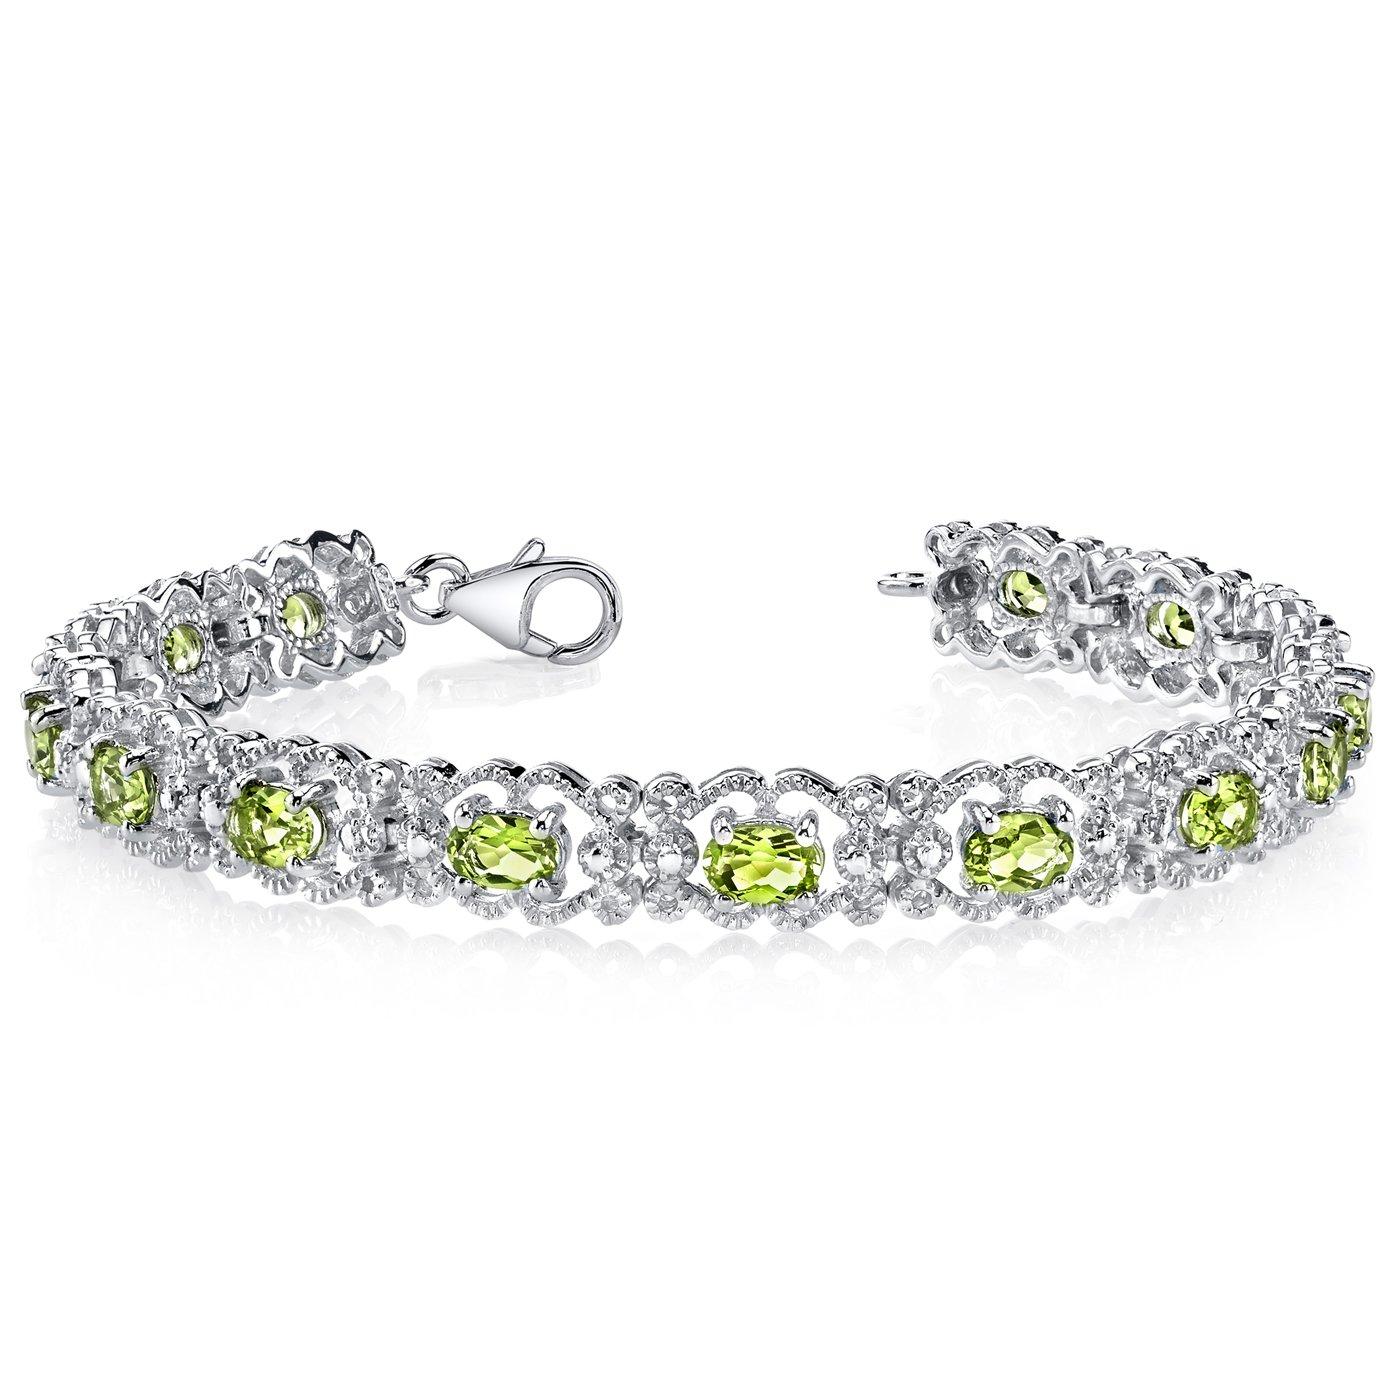 Peridot Bracelet Sterling Silver 7.00 Carats Vintage Design